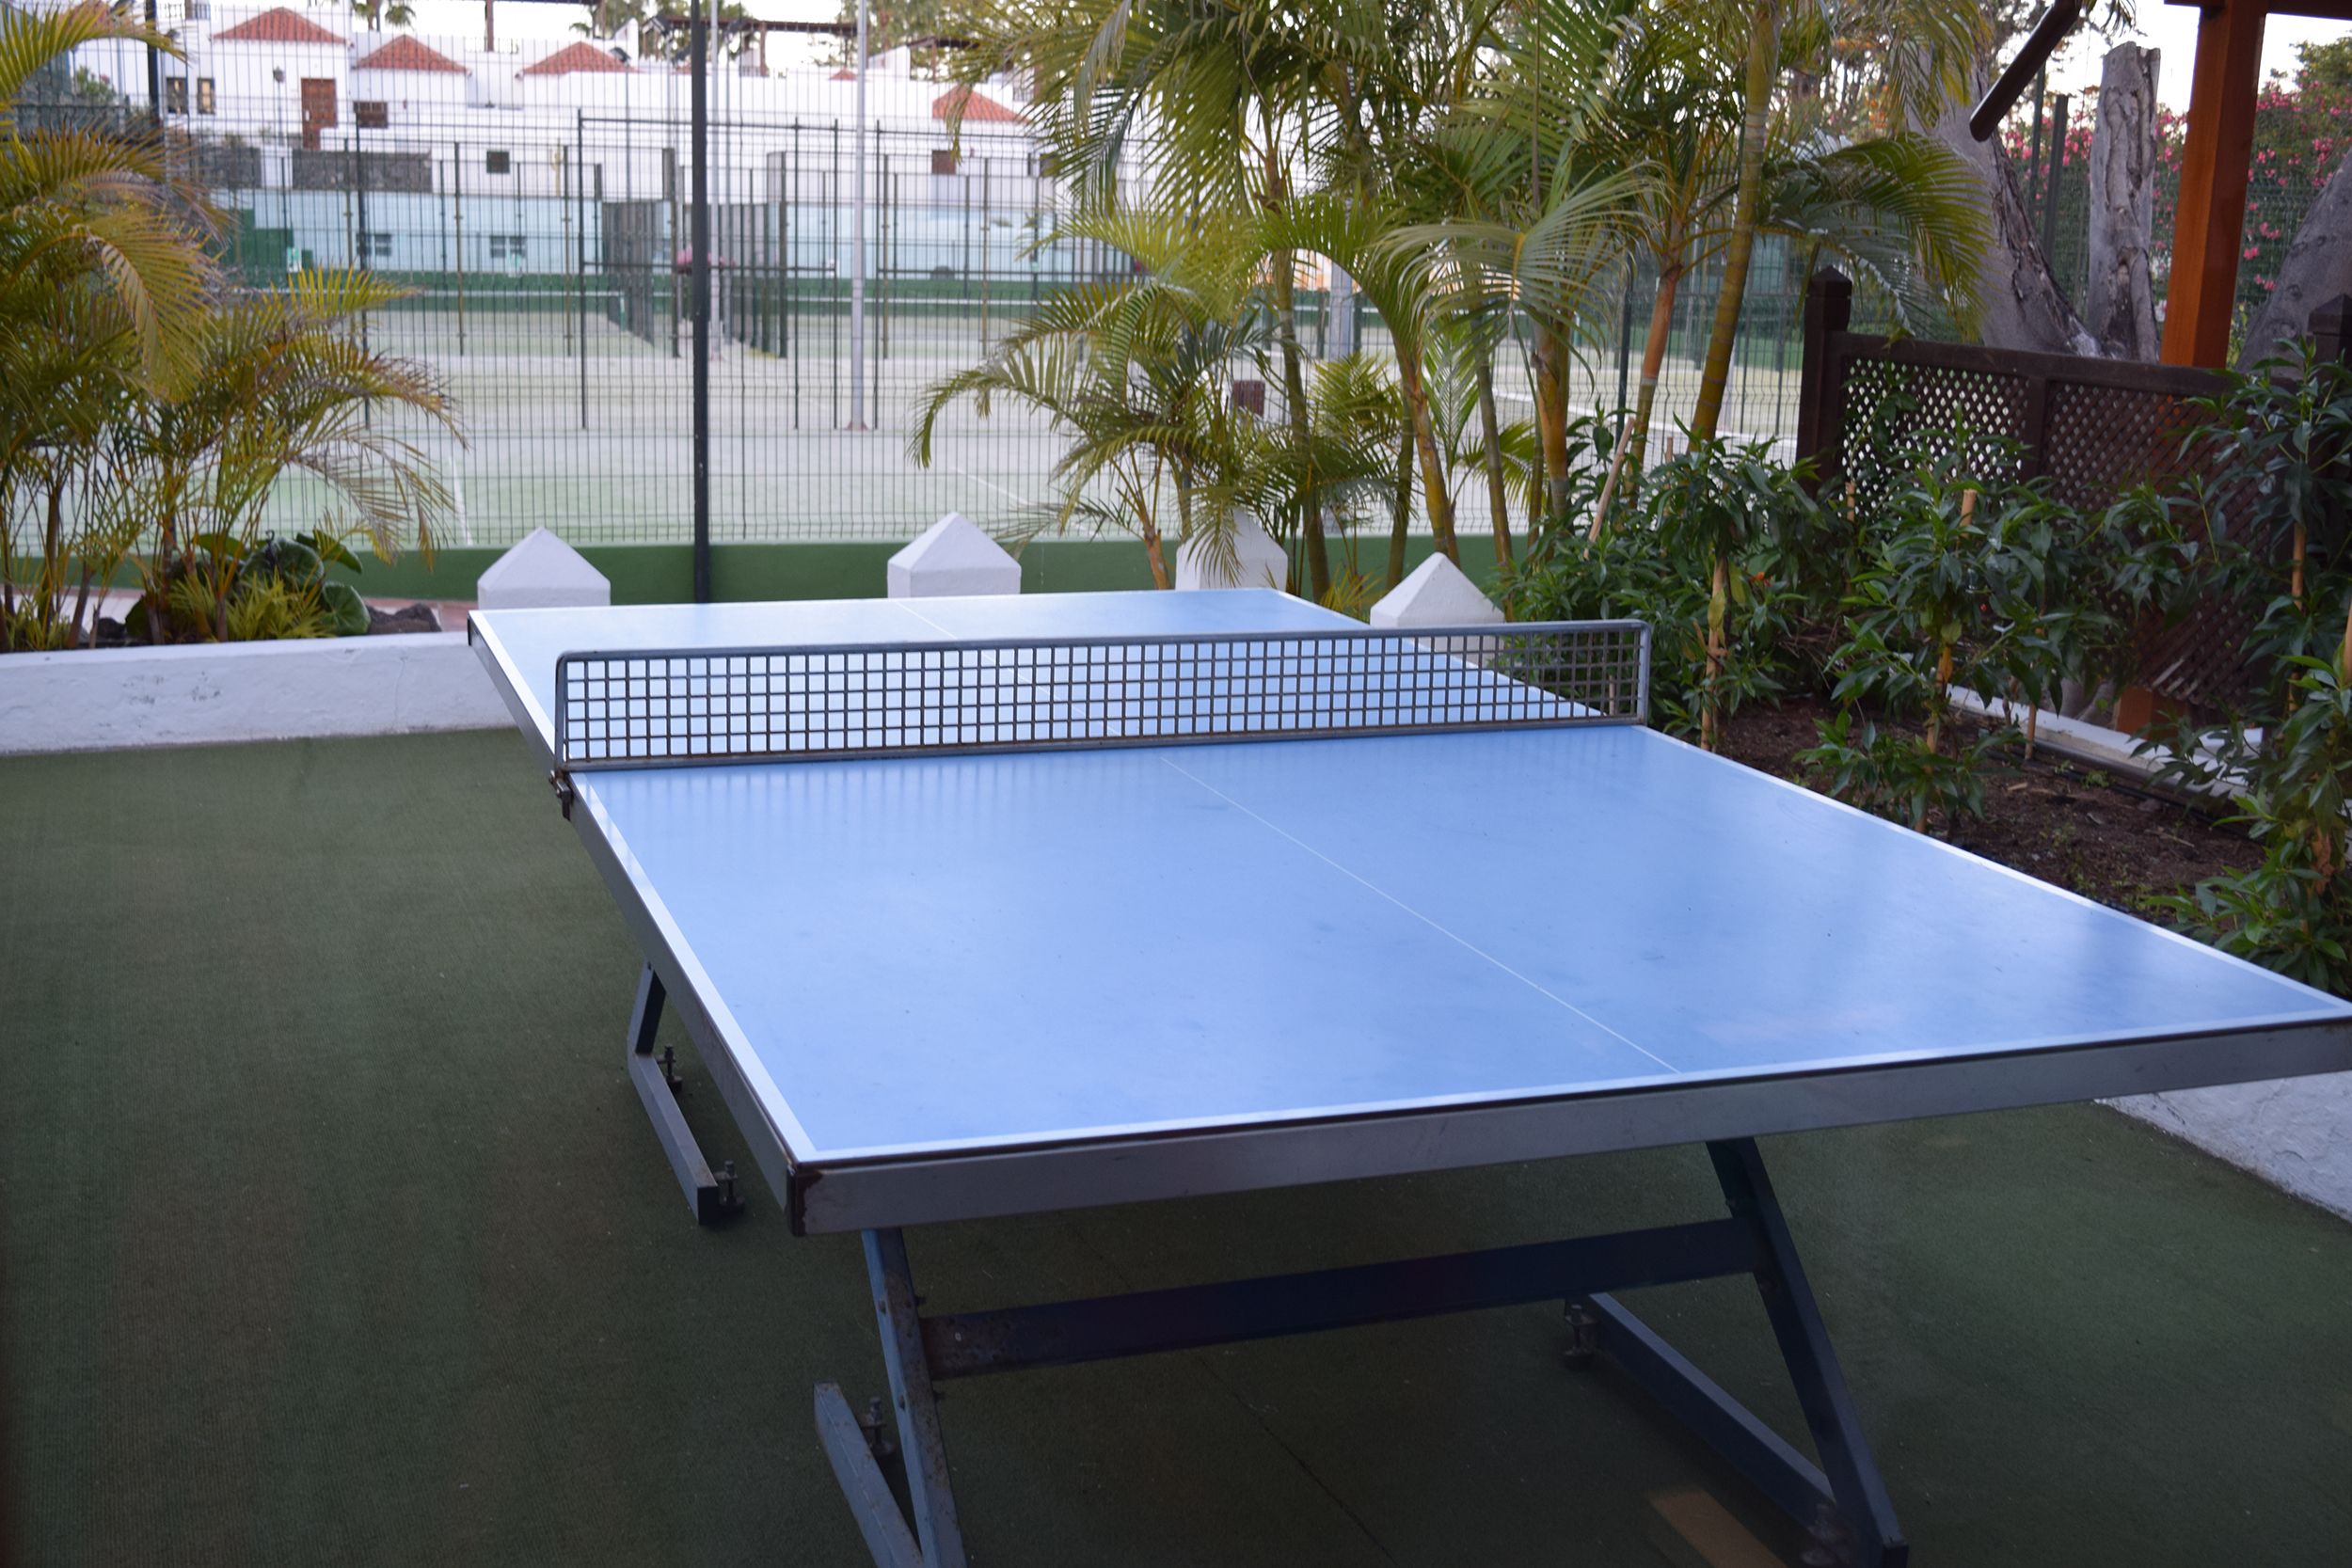 Table tennis La Gomera